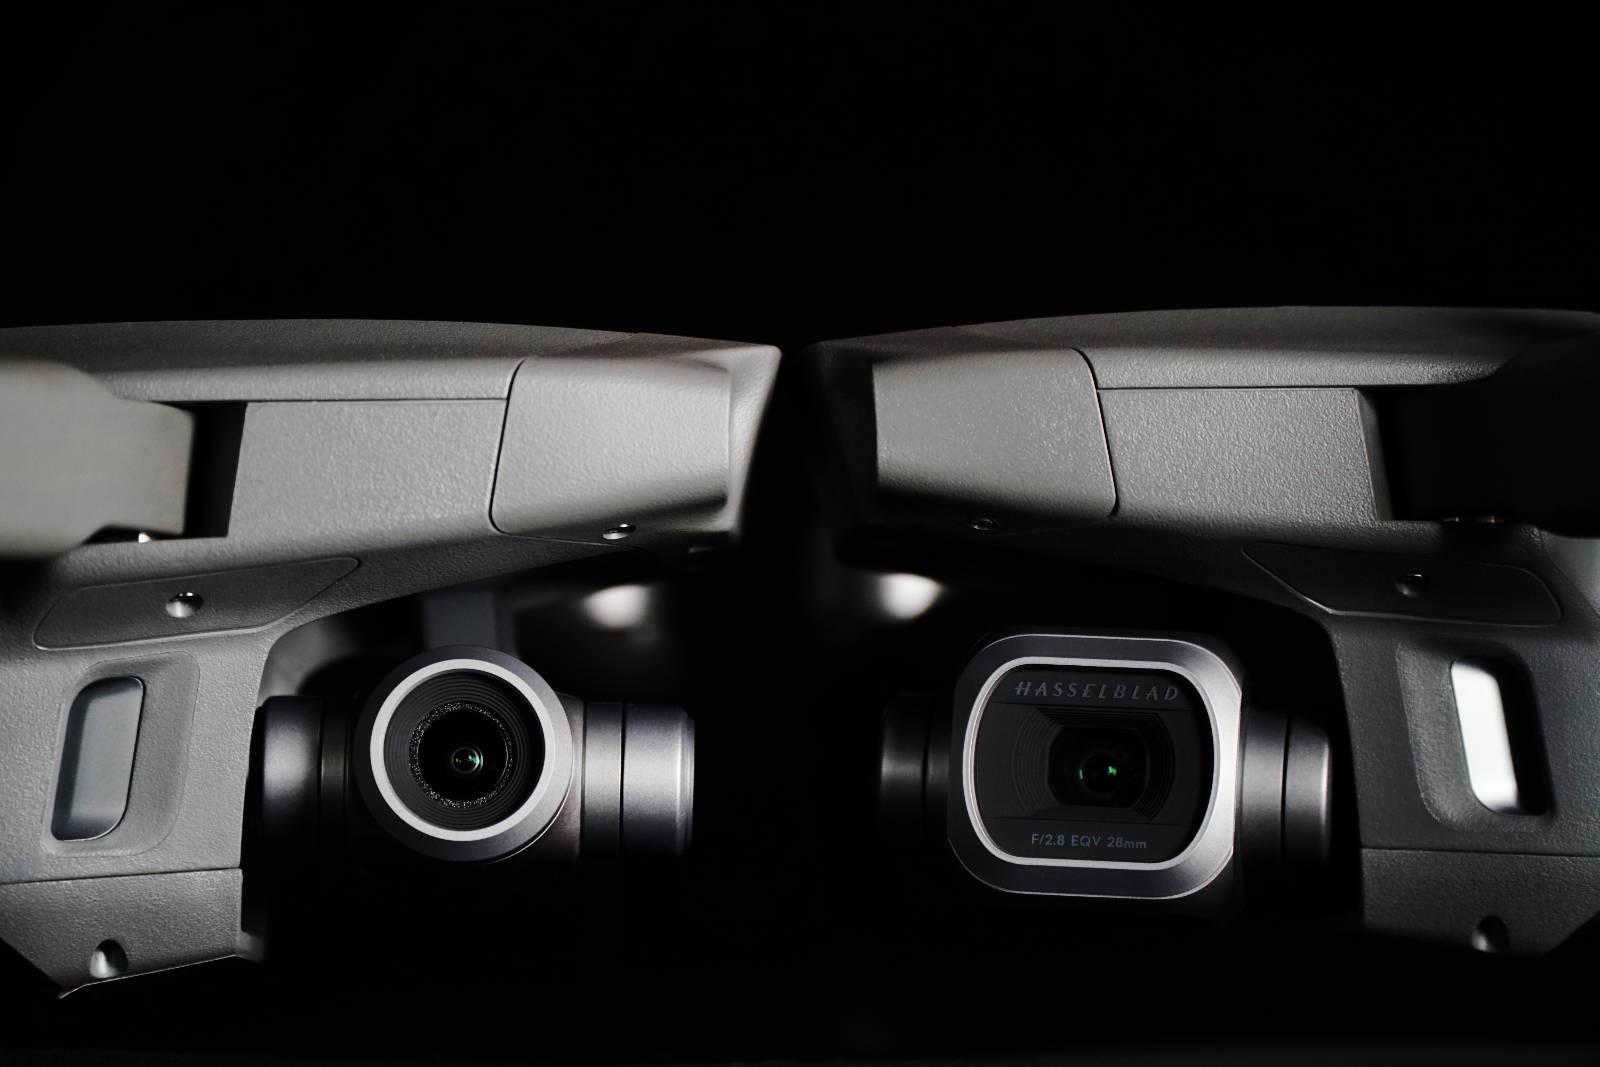 DJI Mavic 2 Pro VS Mavic 2 Zoom: The Ultimate Comparison | MyFirstDrone